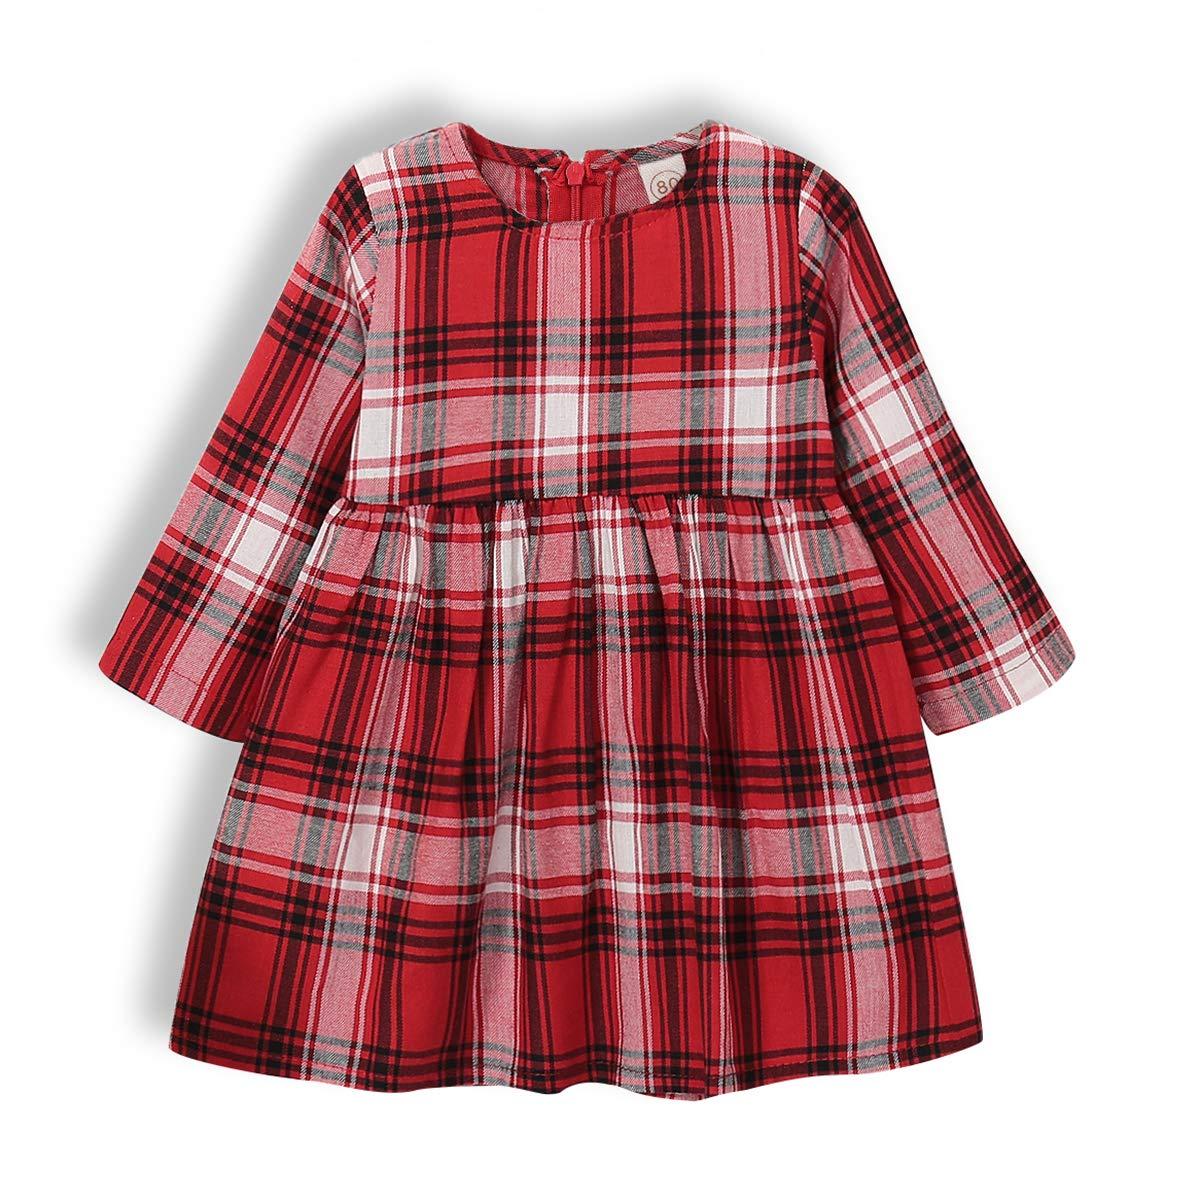 BELS Toddler Baby Girl Christmas Clothes Red Plaids Long Sleeve Princess Autumn Tutu Dress